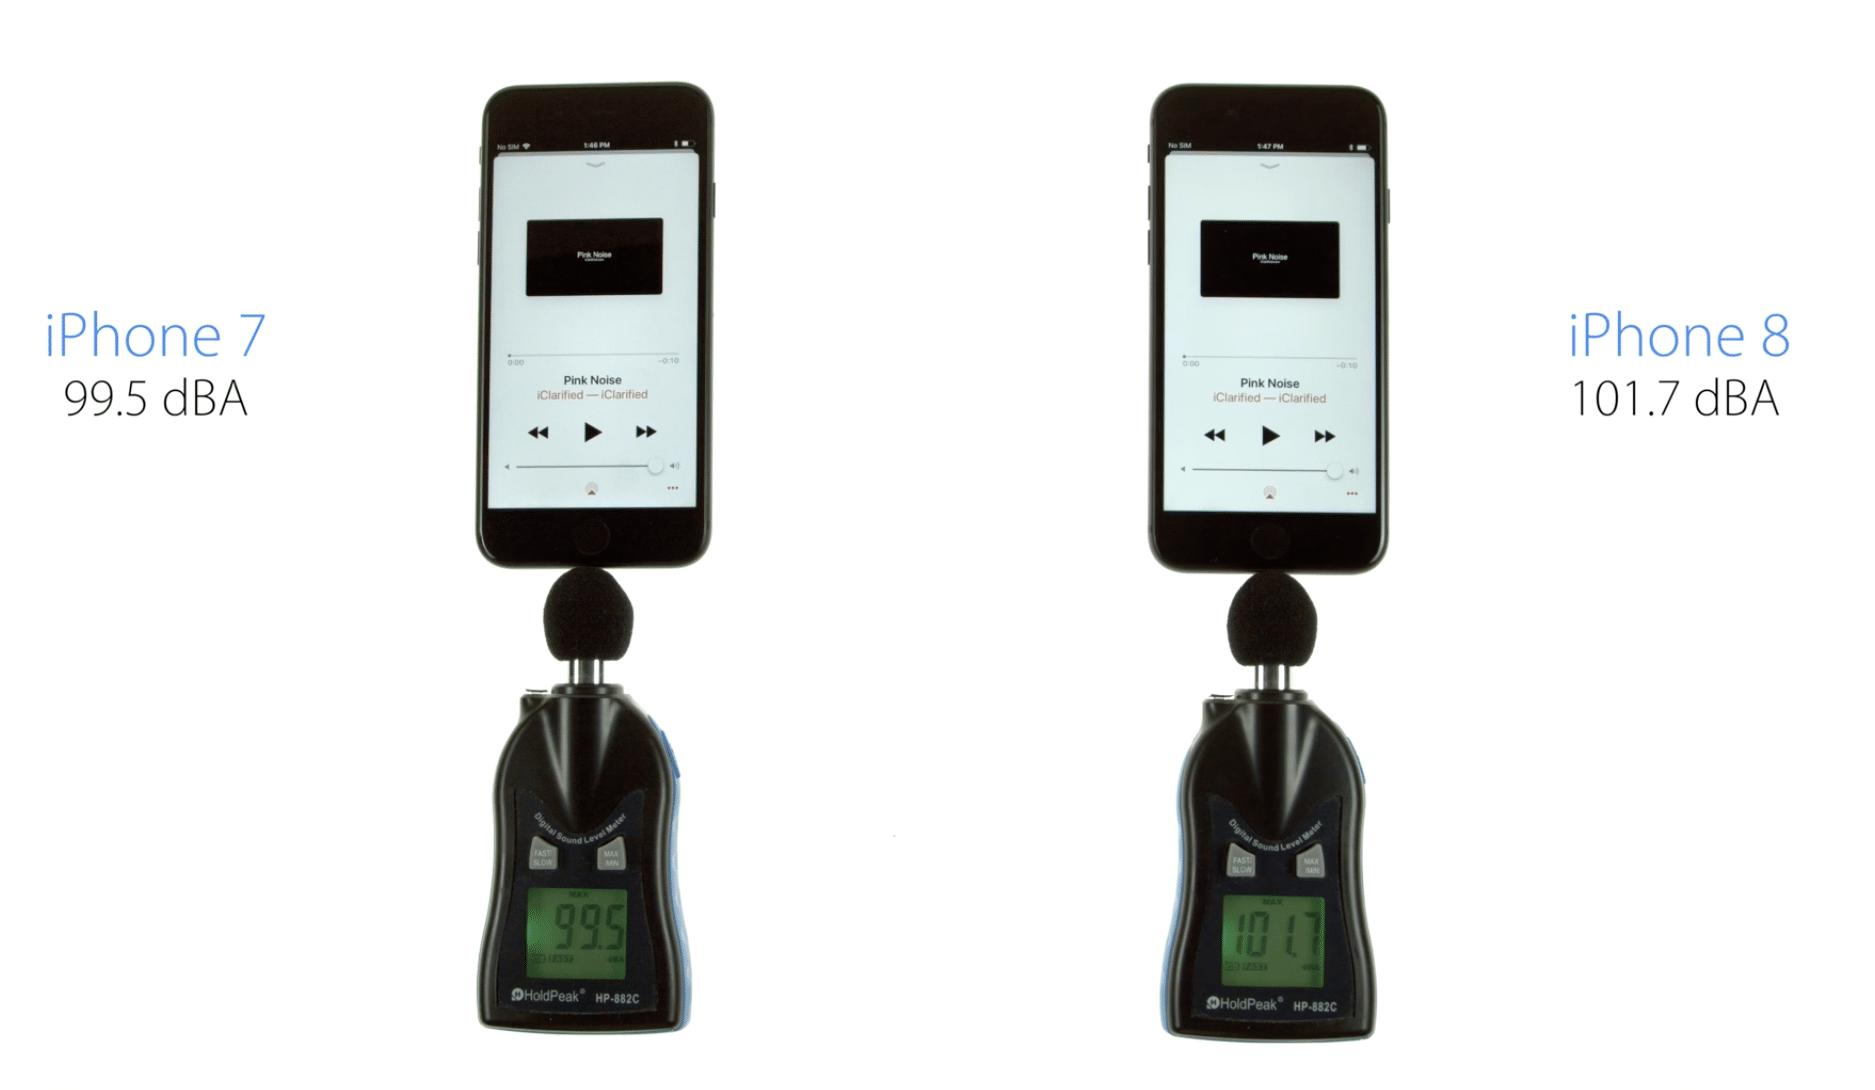 speaker-volume-test-iphone-8-vs-iphone-7-video 2